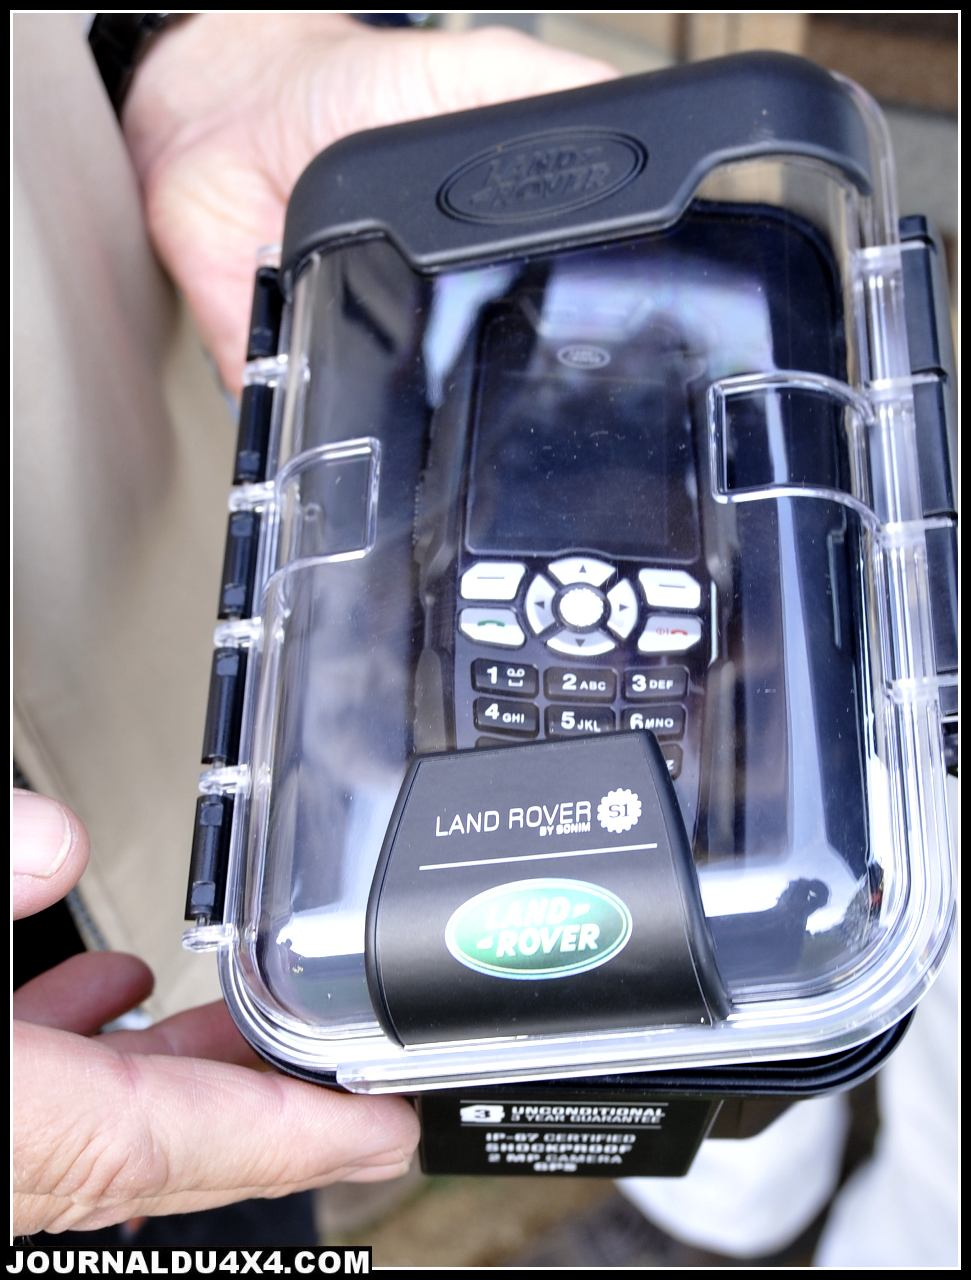 telephone-land-rover.jpg